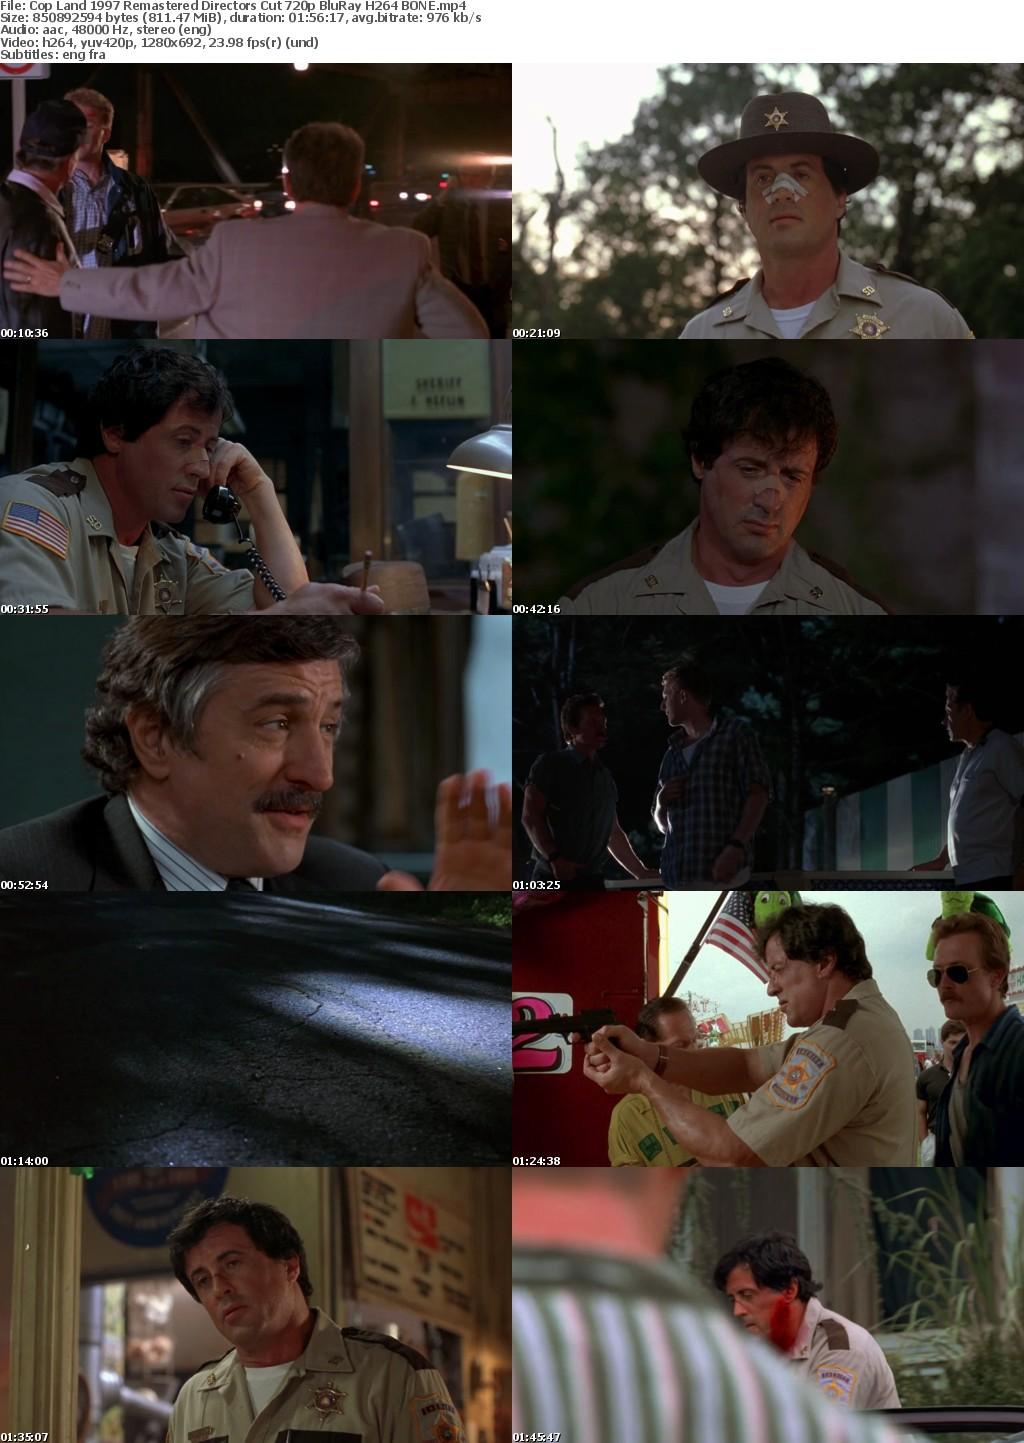 Cop Land 1997 Remastered Directors Cut 720p BluRay H264 BONE